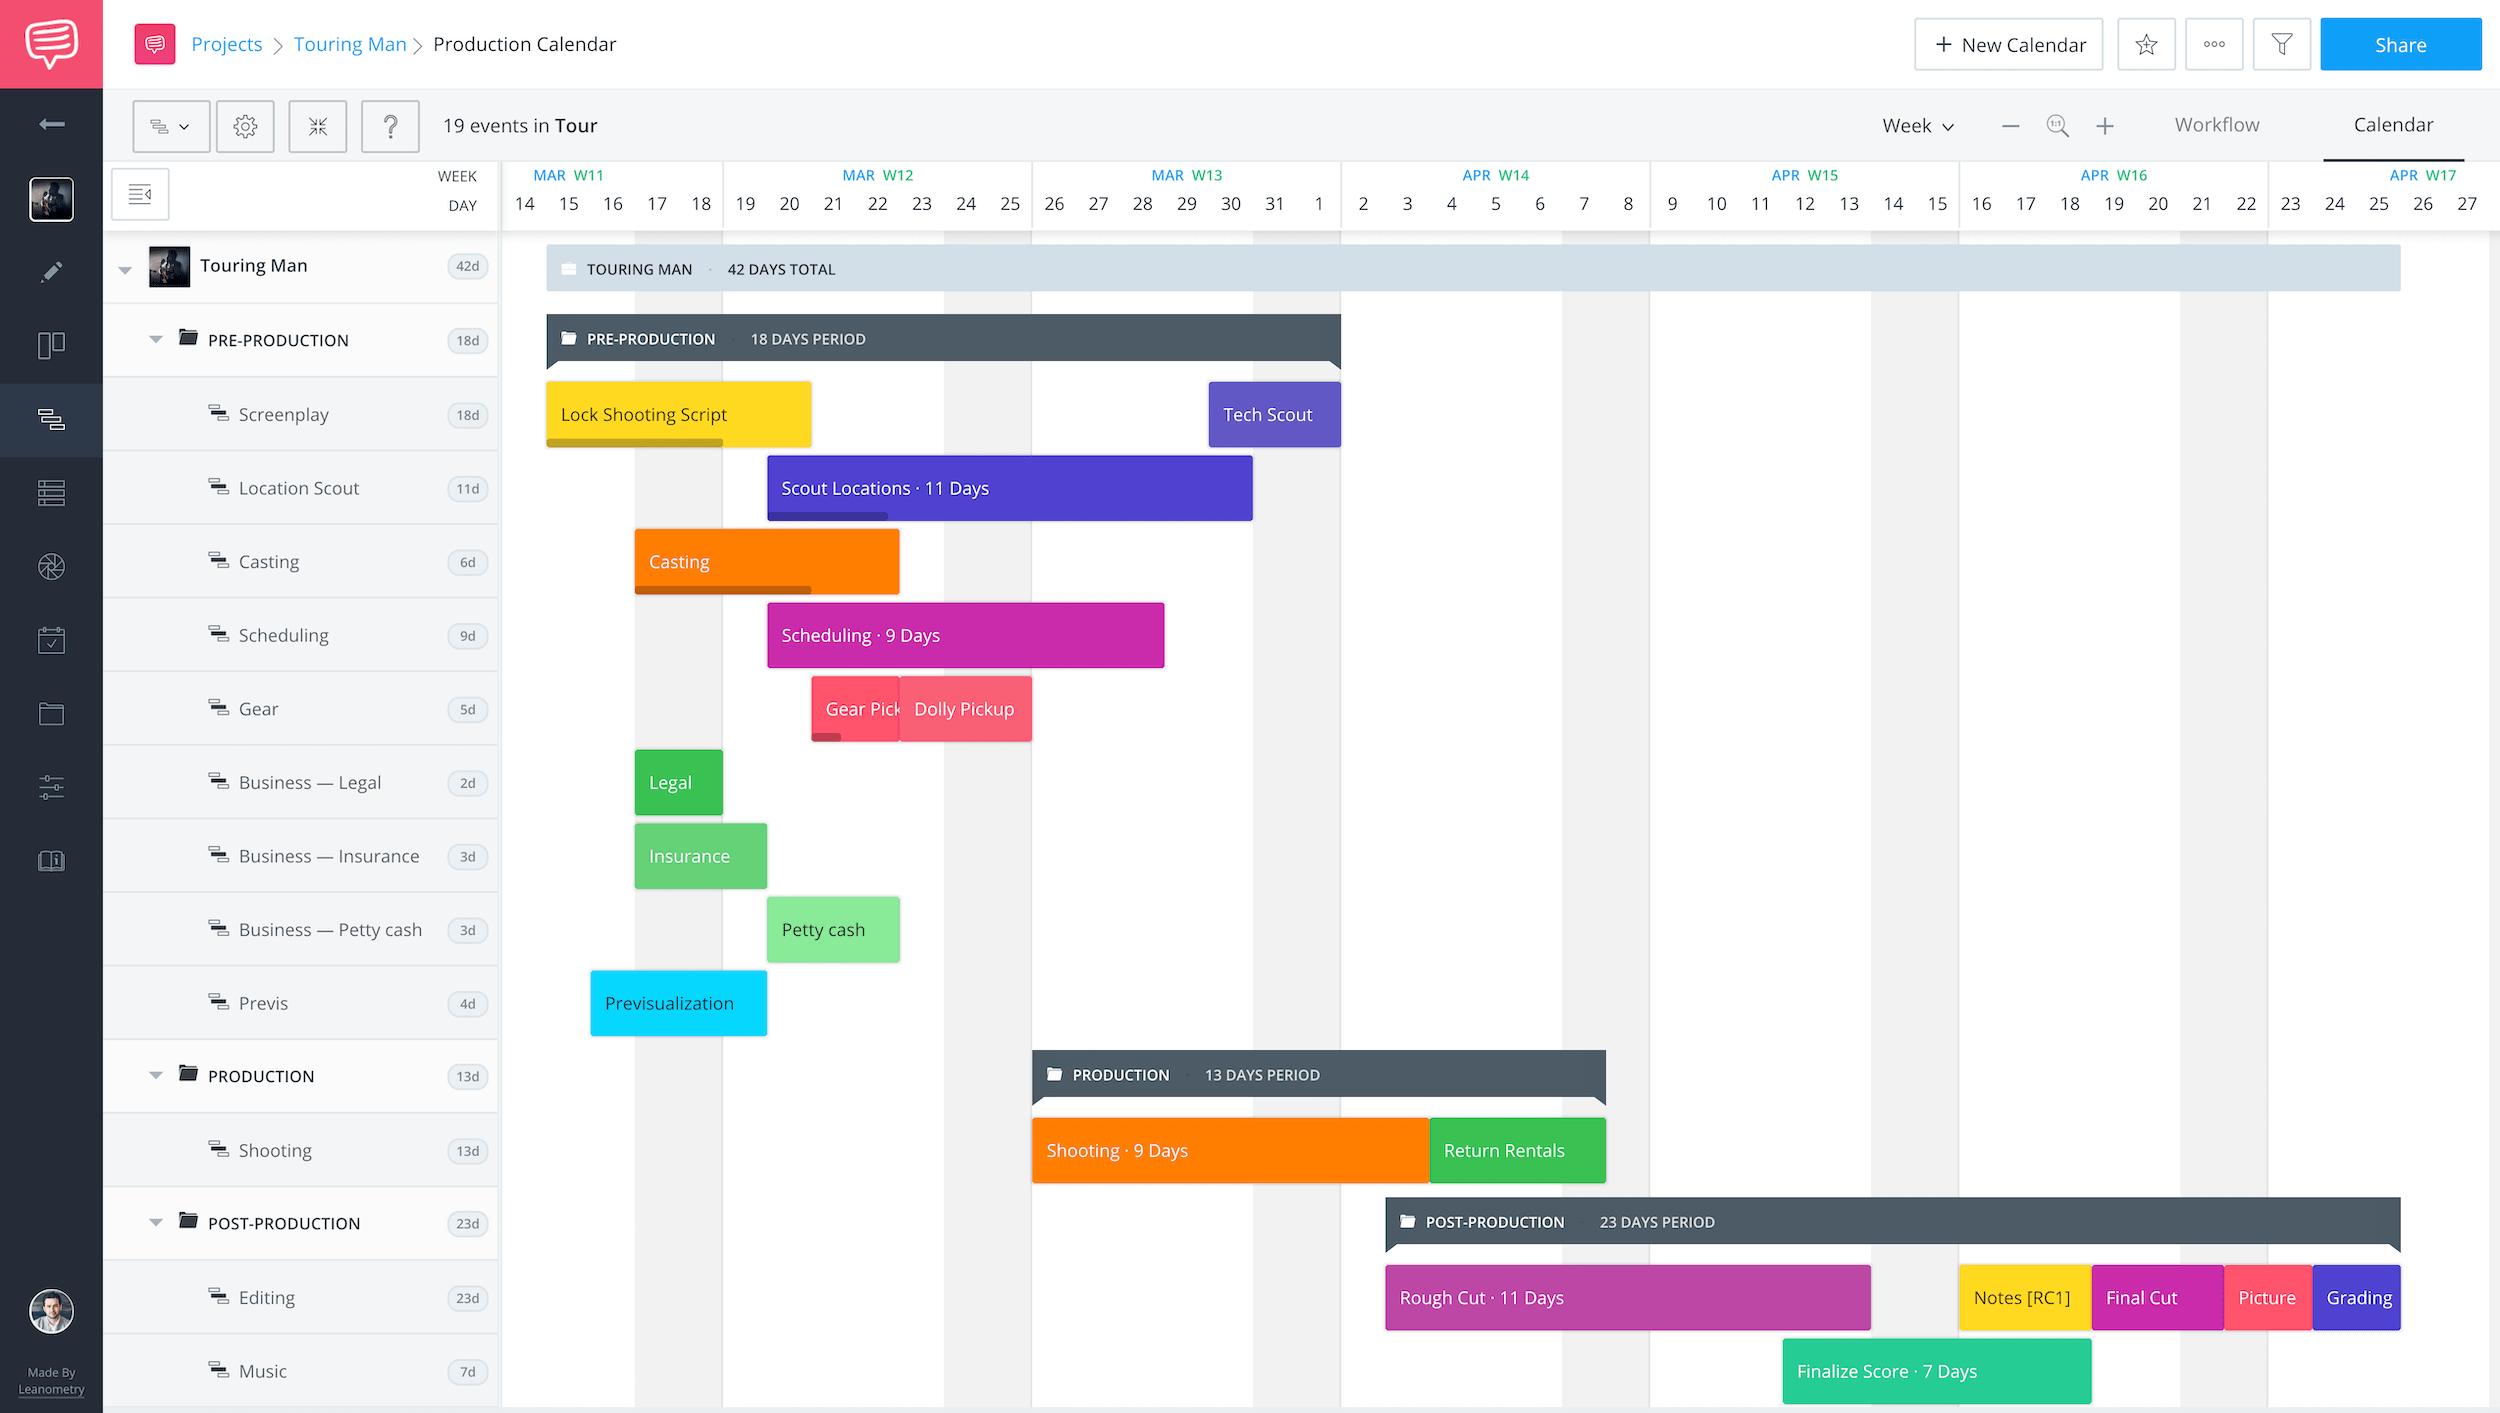 Production Calendar - Project Management - StudioBinder